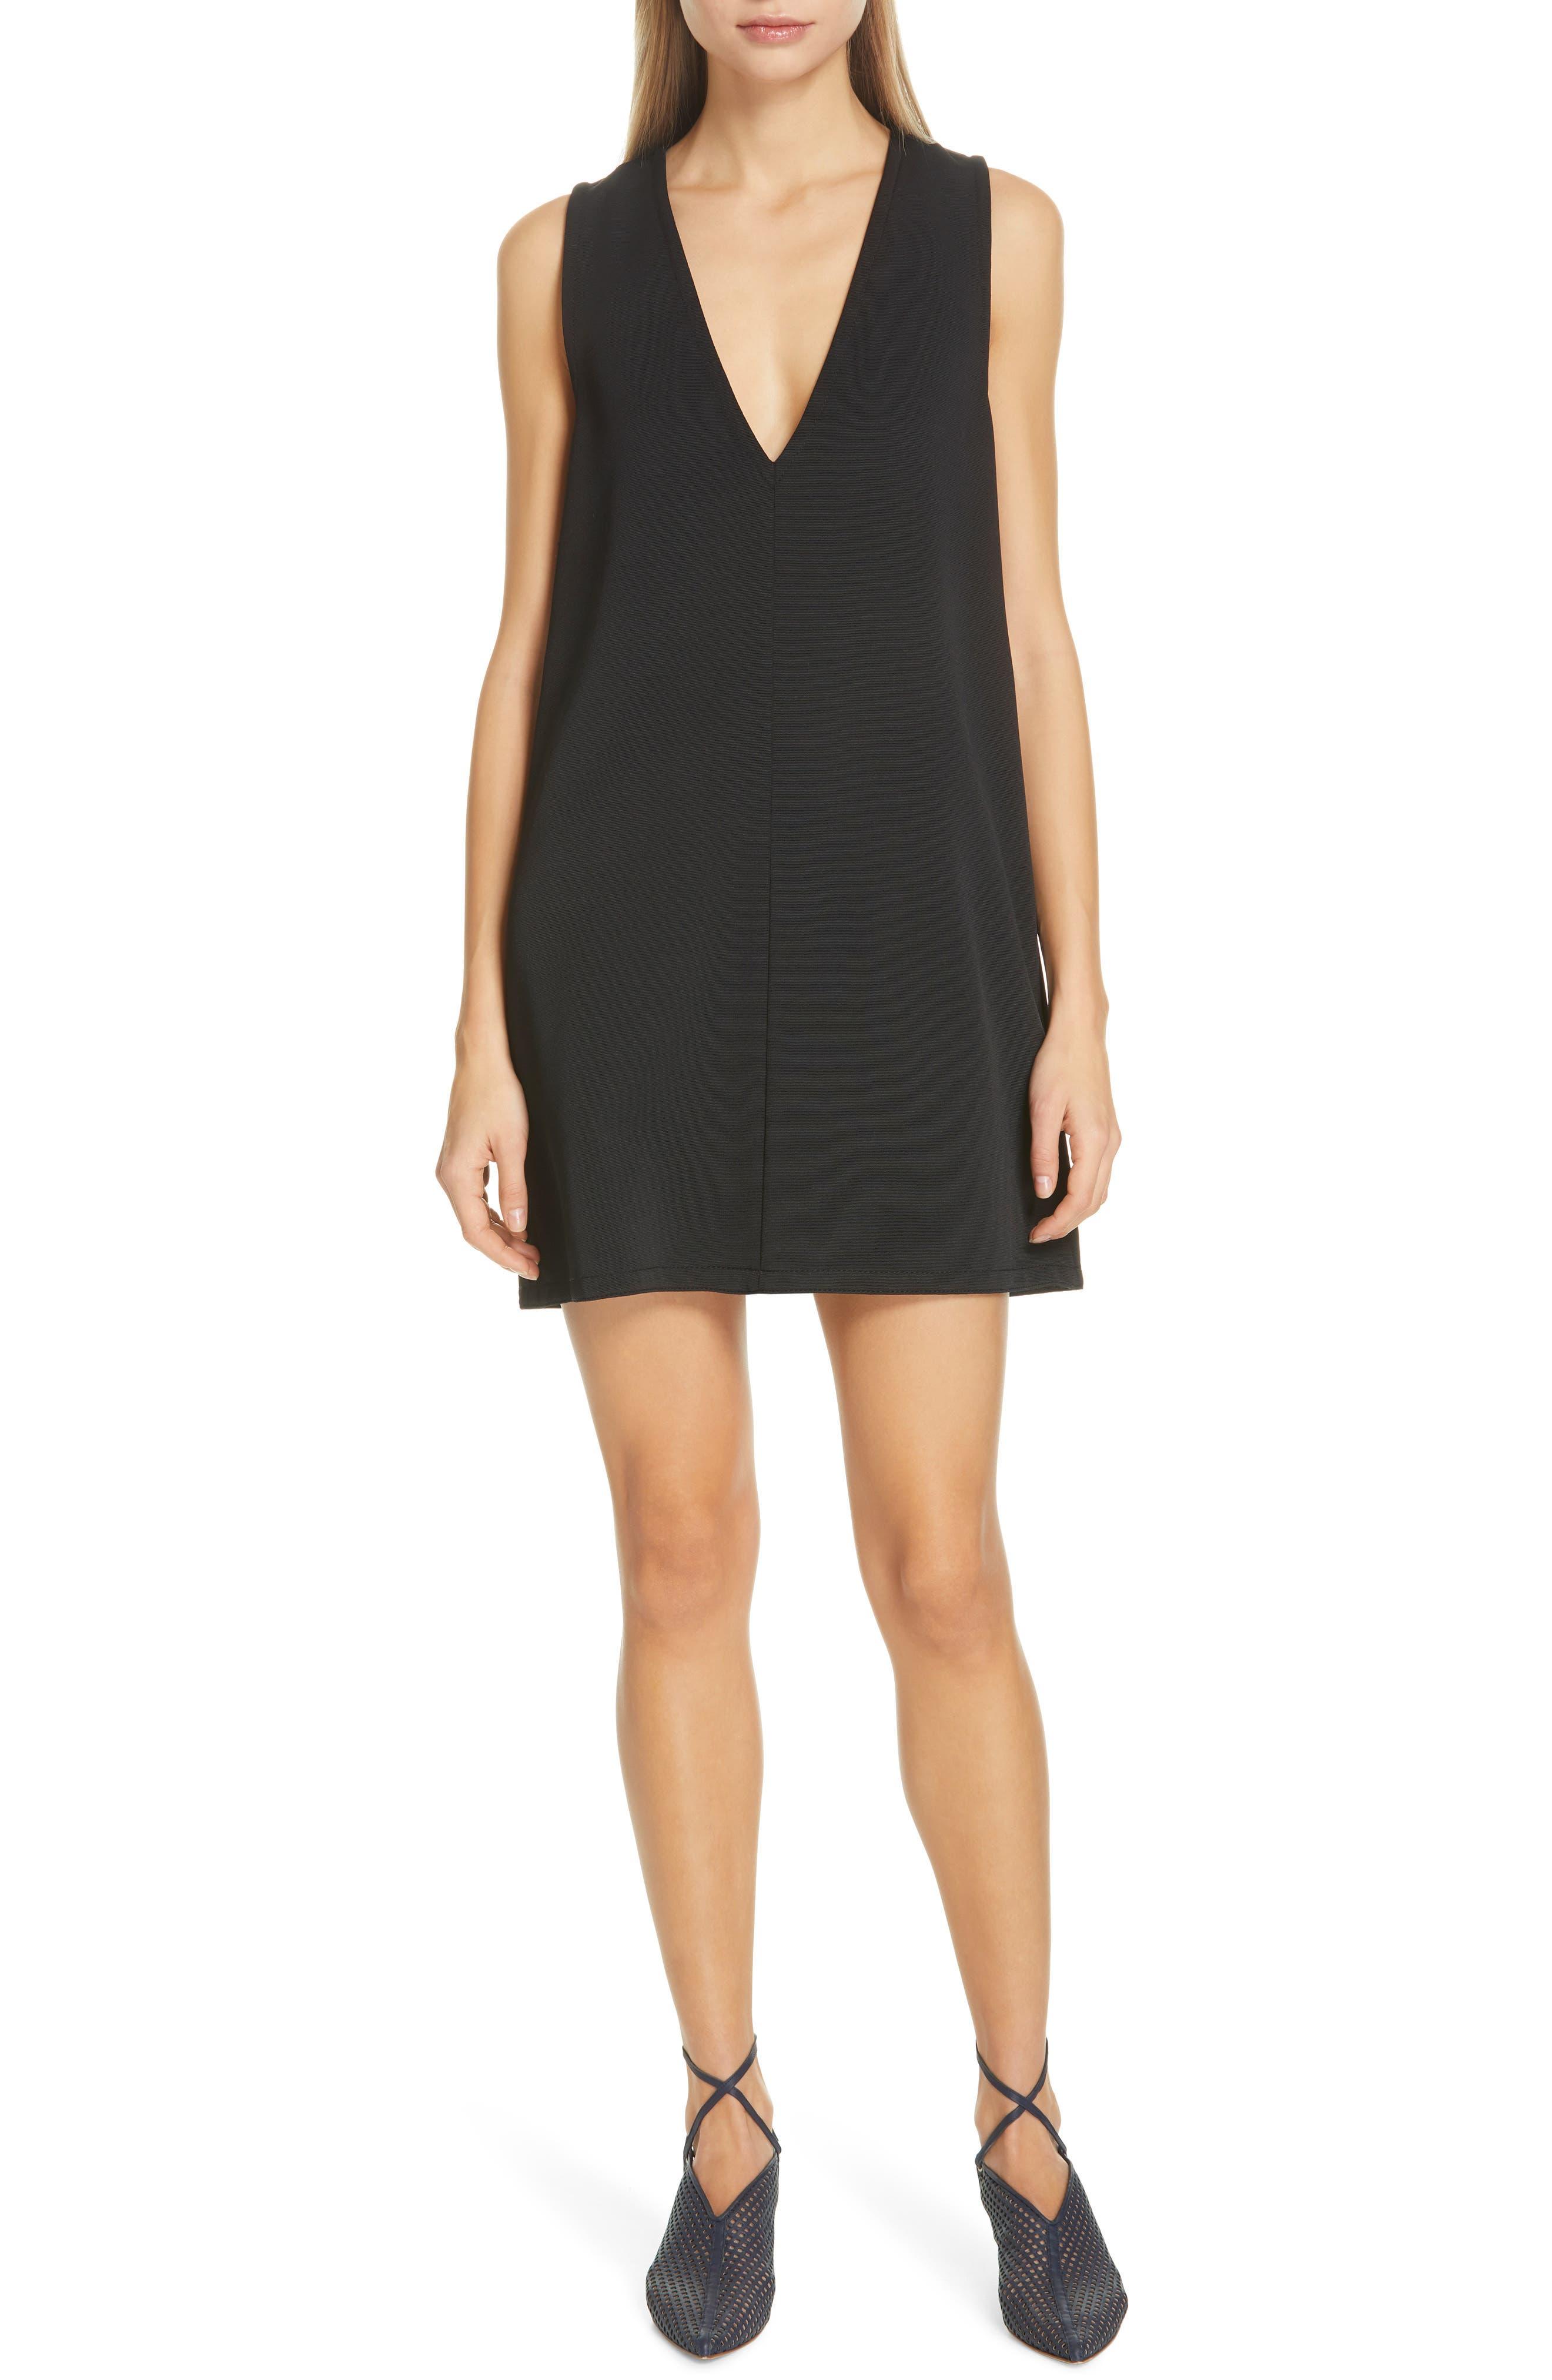 Tibi Frisse Plunging Shift Dress, Black